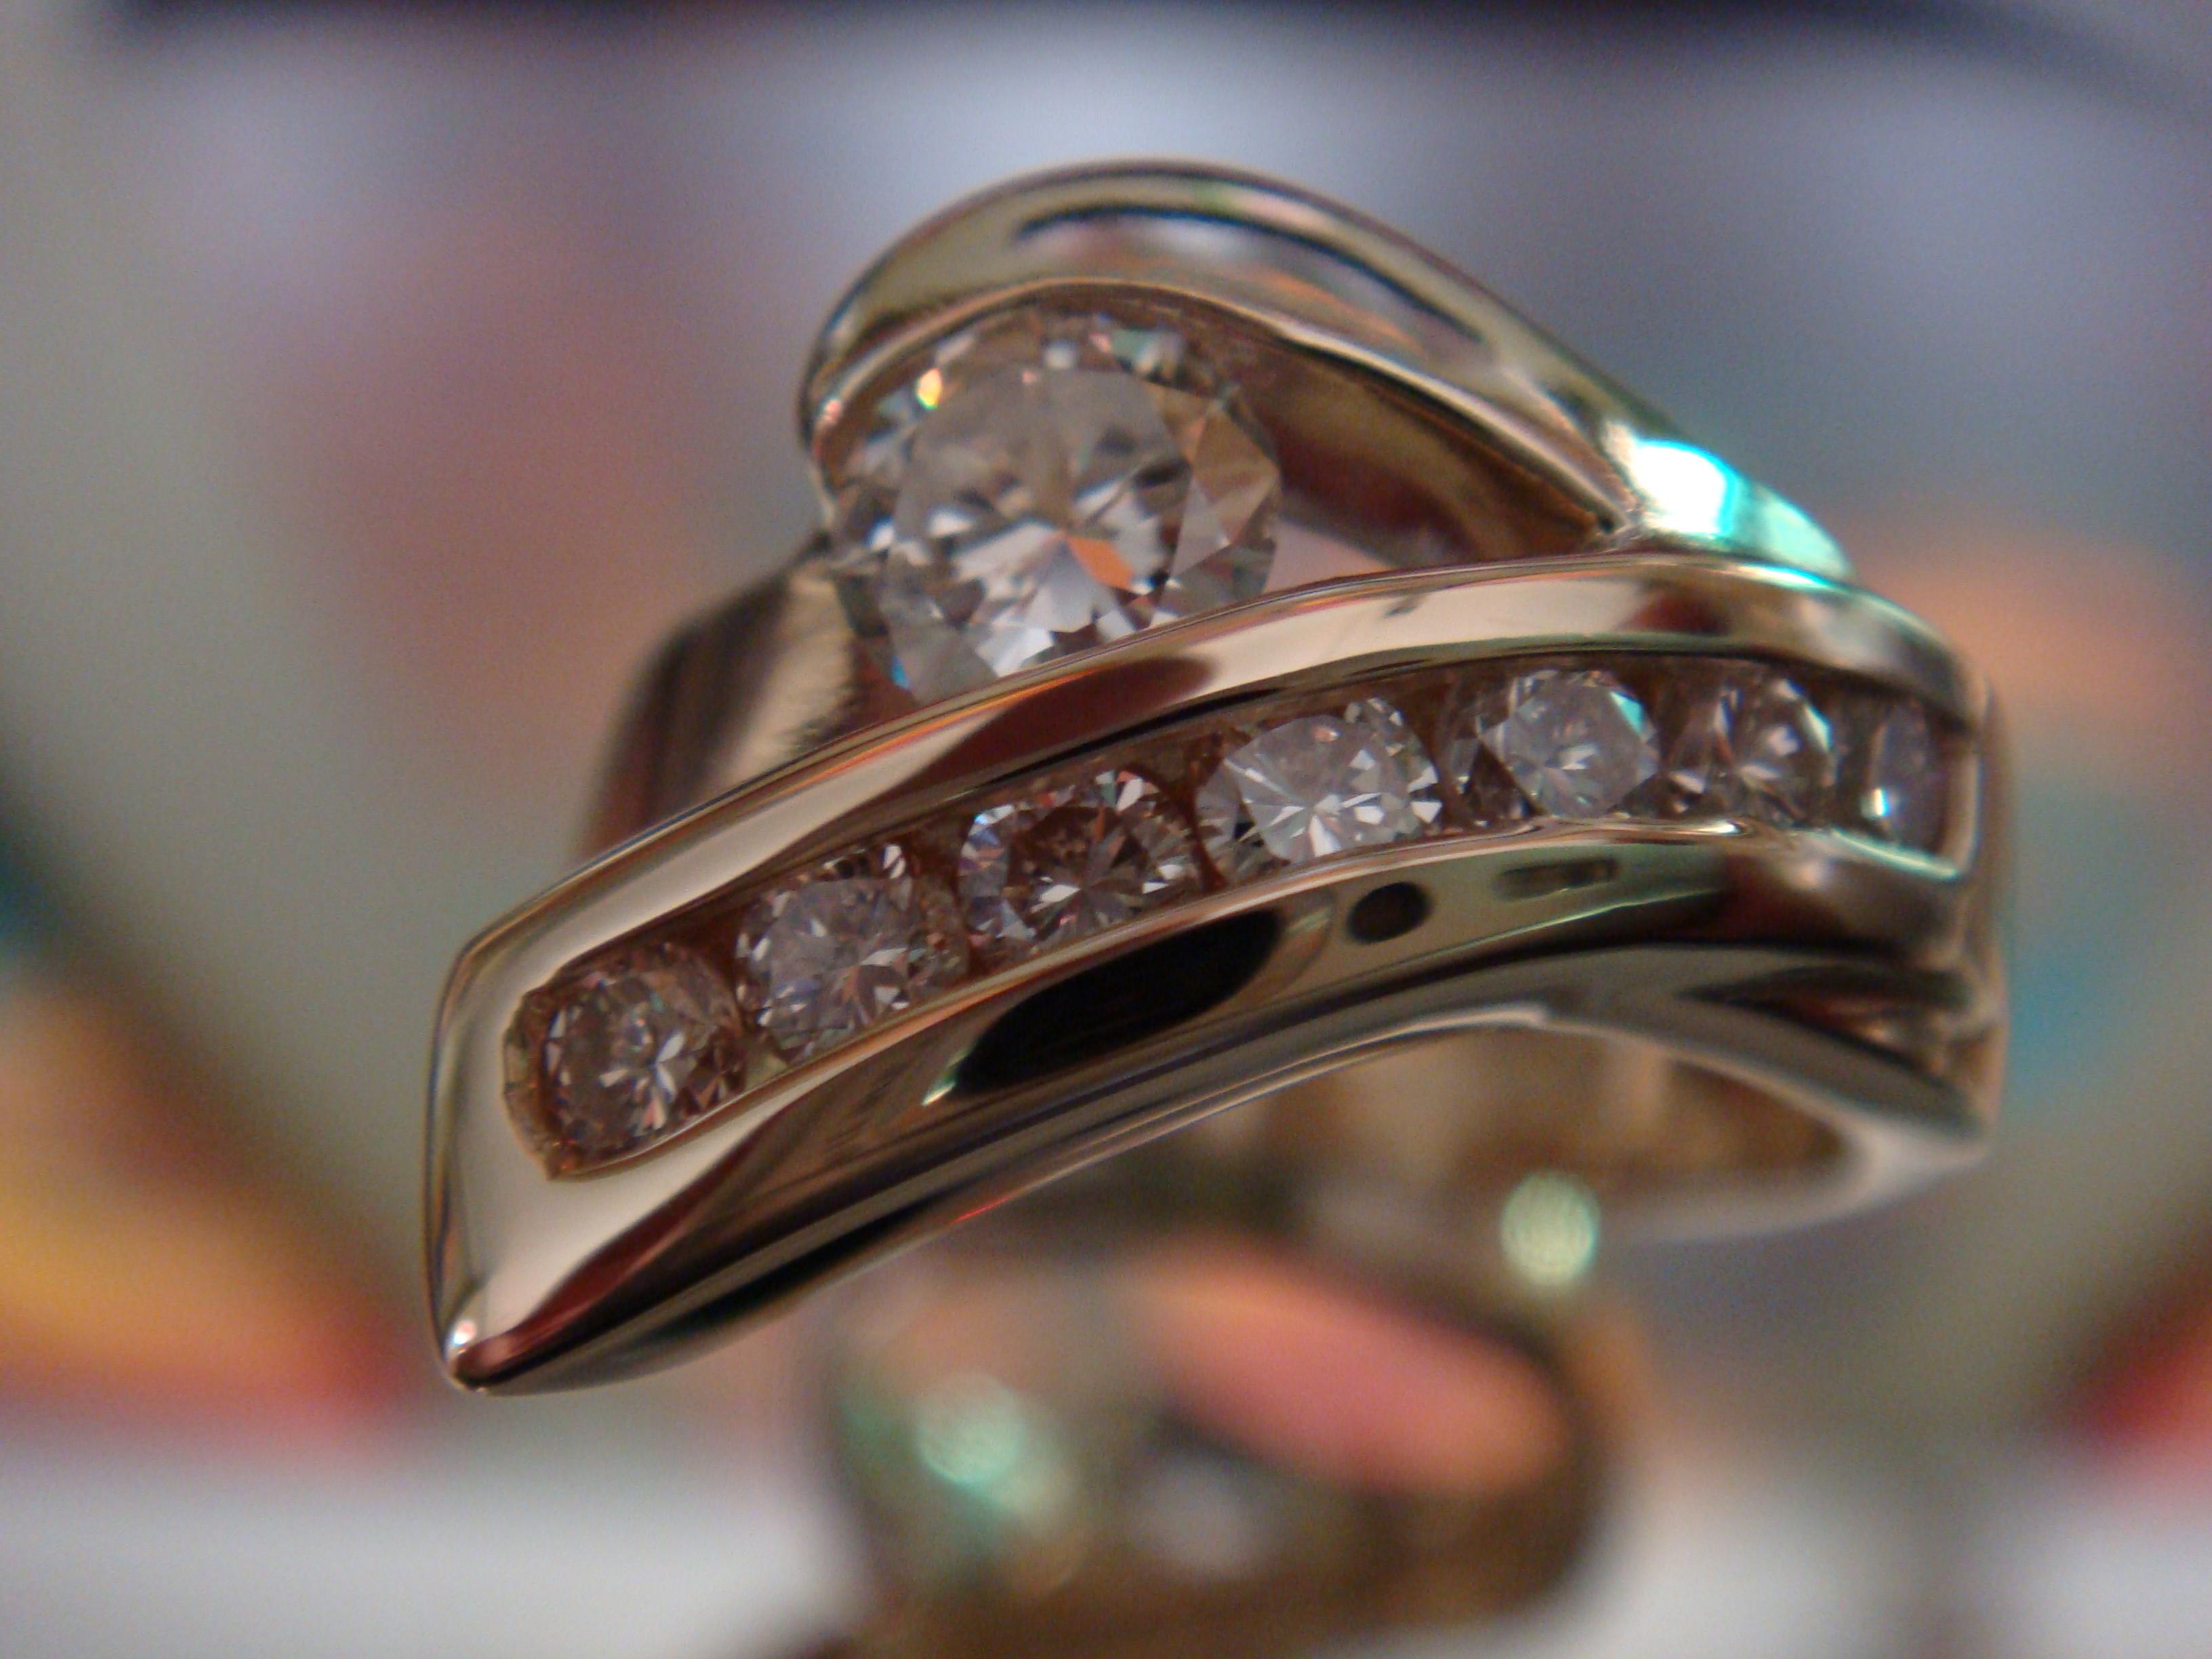 Two-tone with diamonds